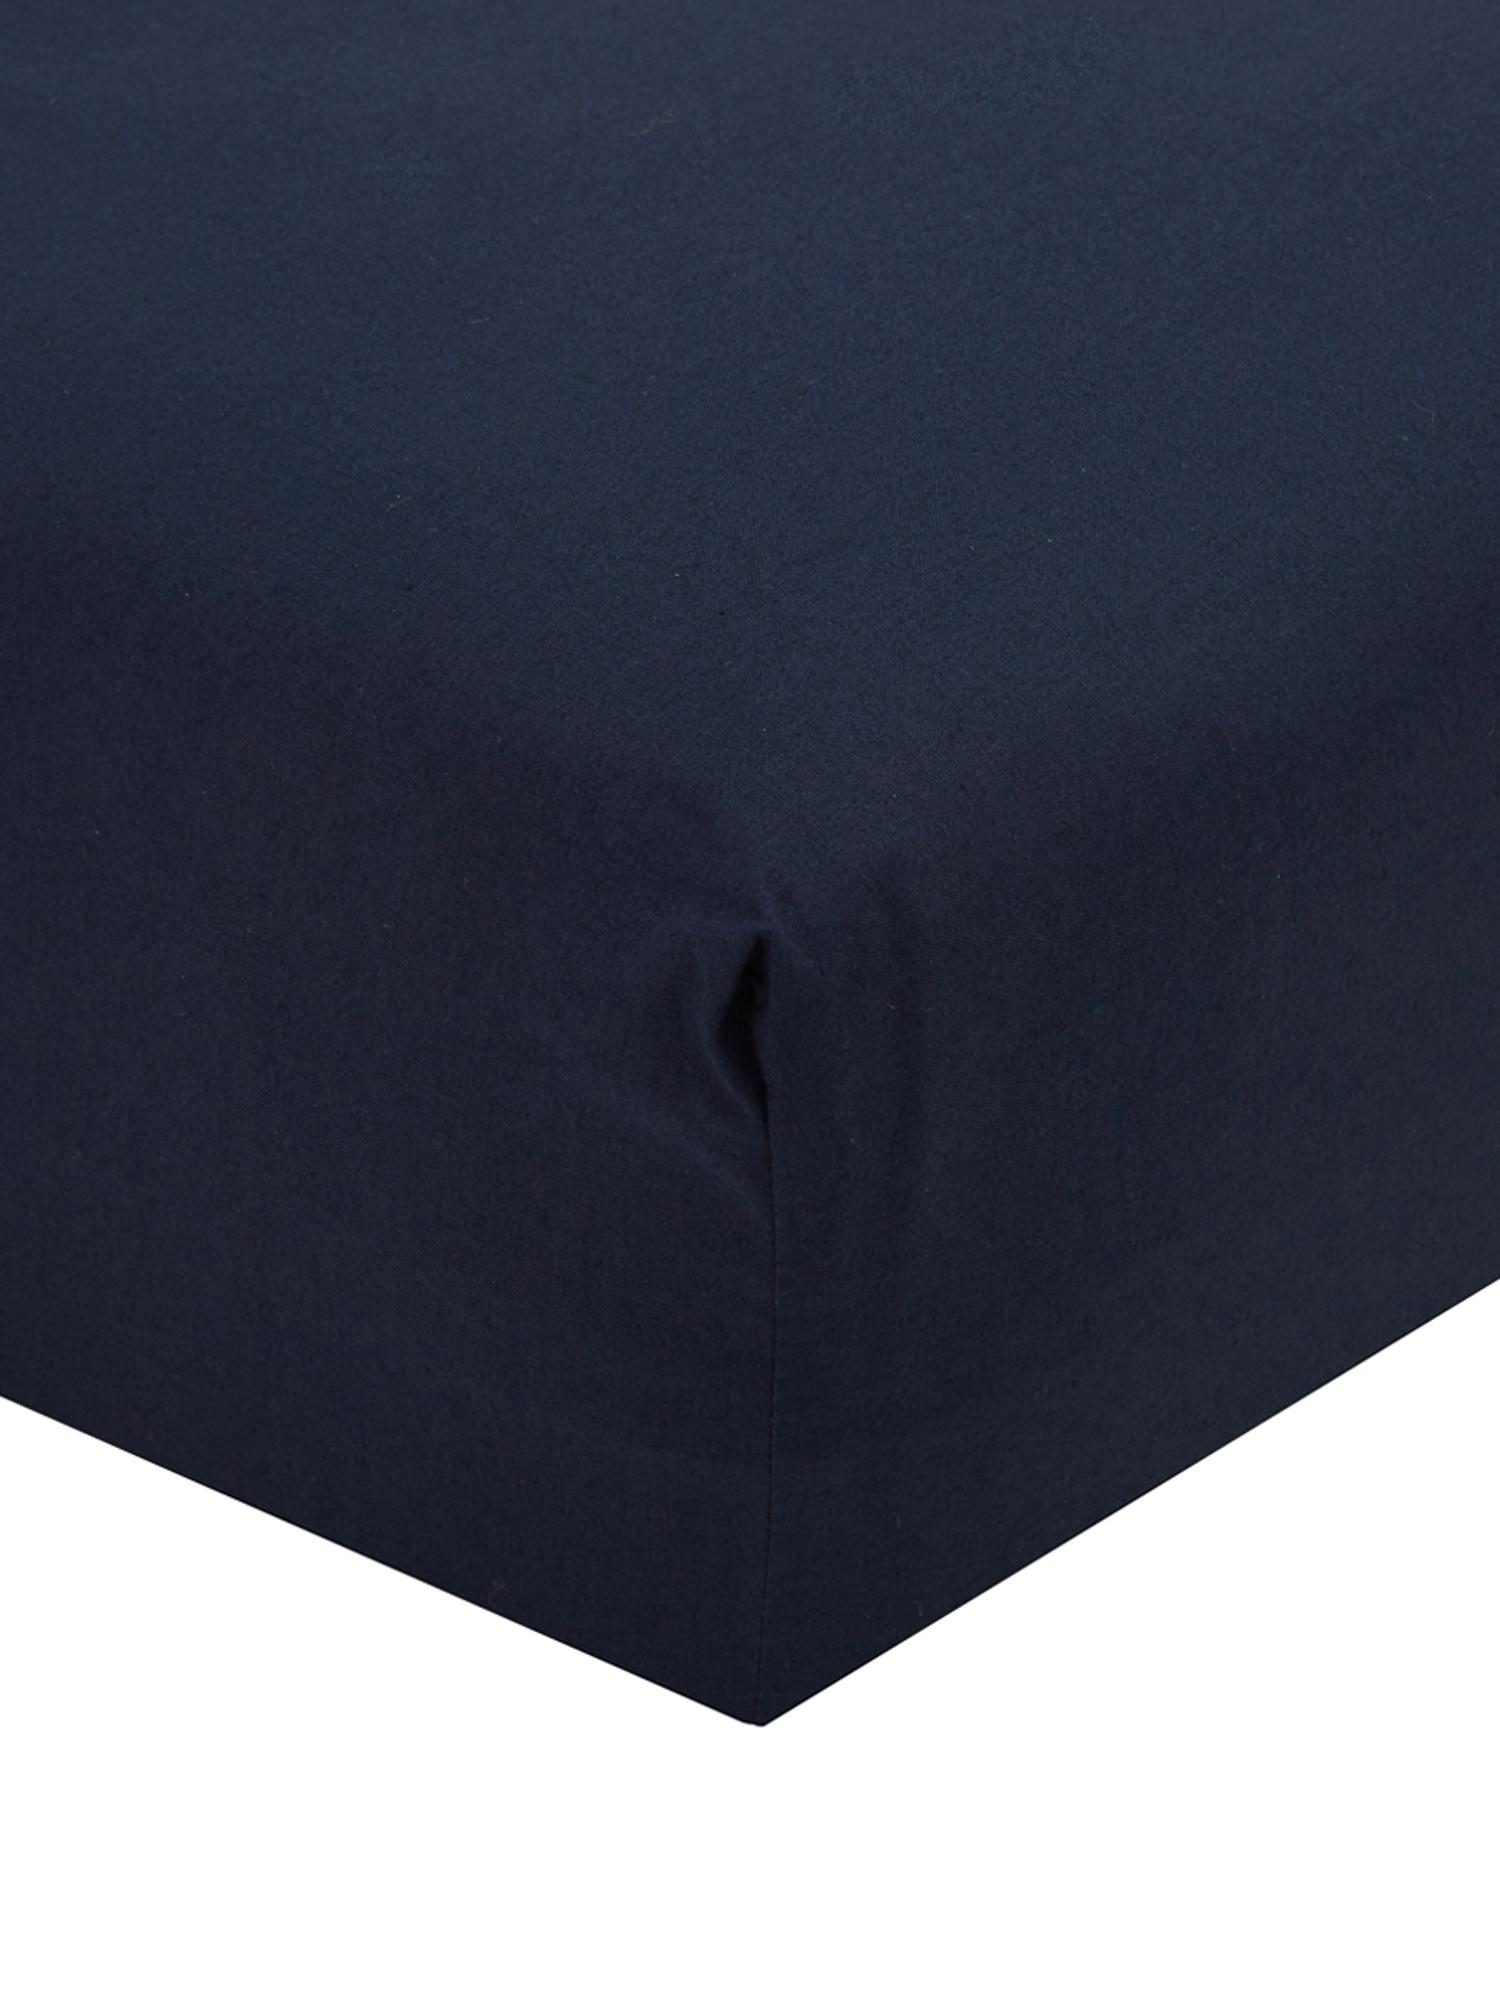 Lenzuolo con angoli in percalle Elsie, Tessuto: percalle, Blu scuro, Larg. 90 x Lung. 200 cm